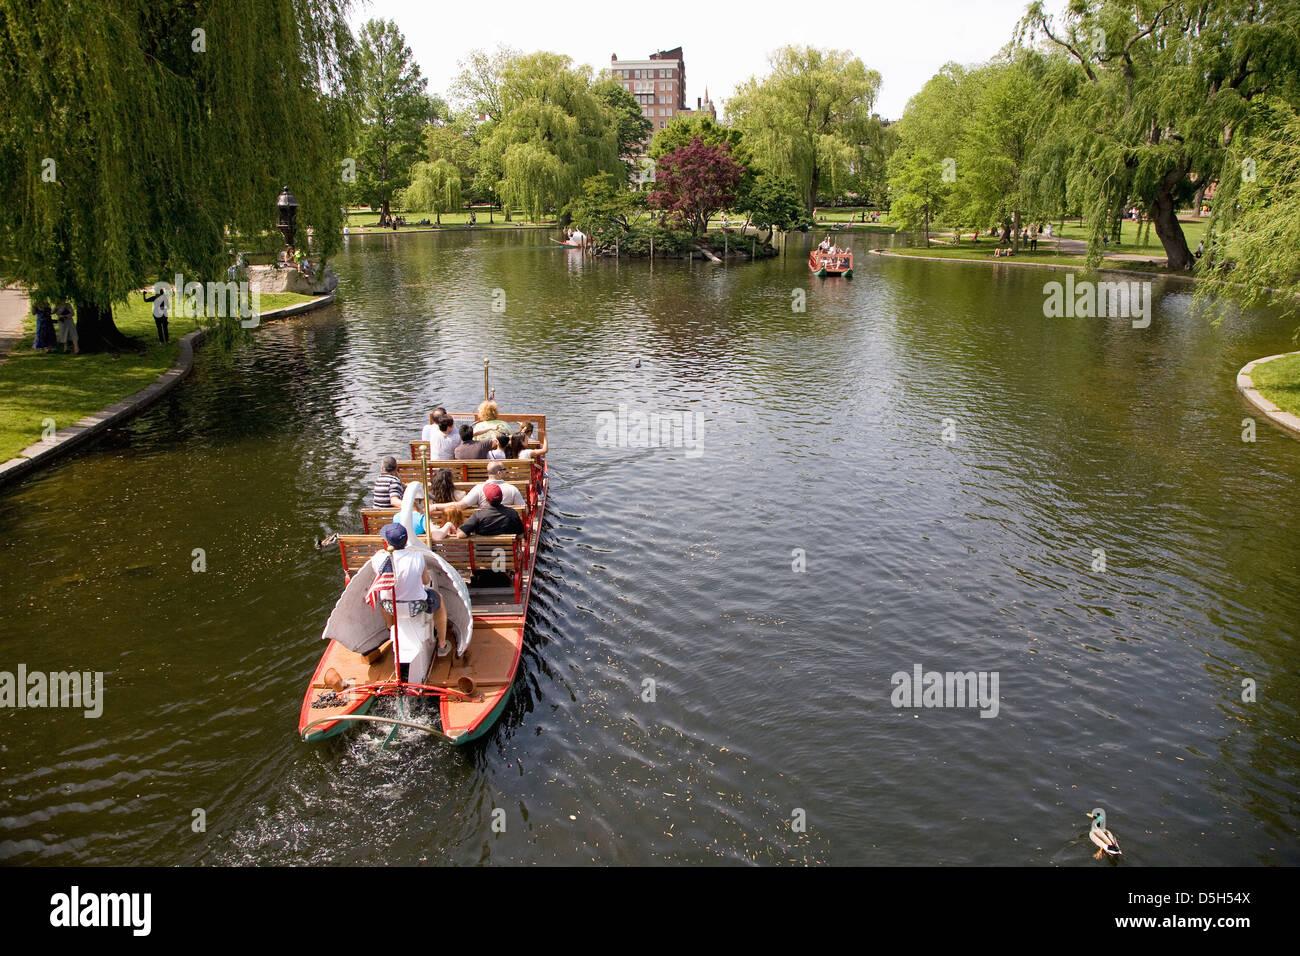 Historic Swan Boats in Boston Public Gardens on a summer day, Boston, MA - Stock Image